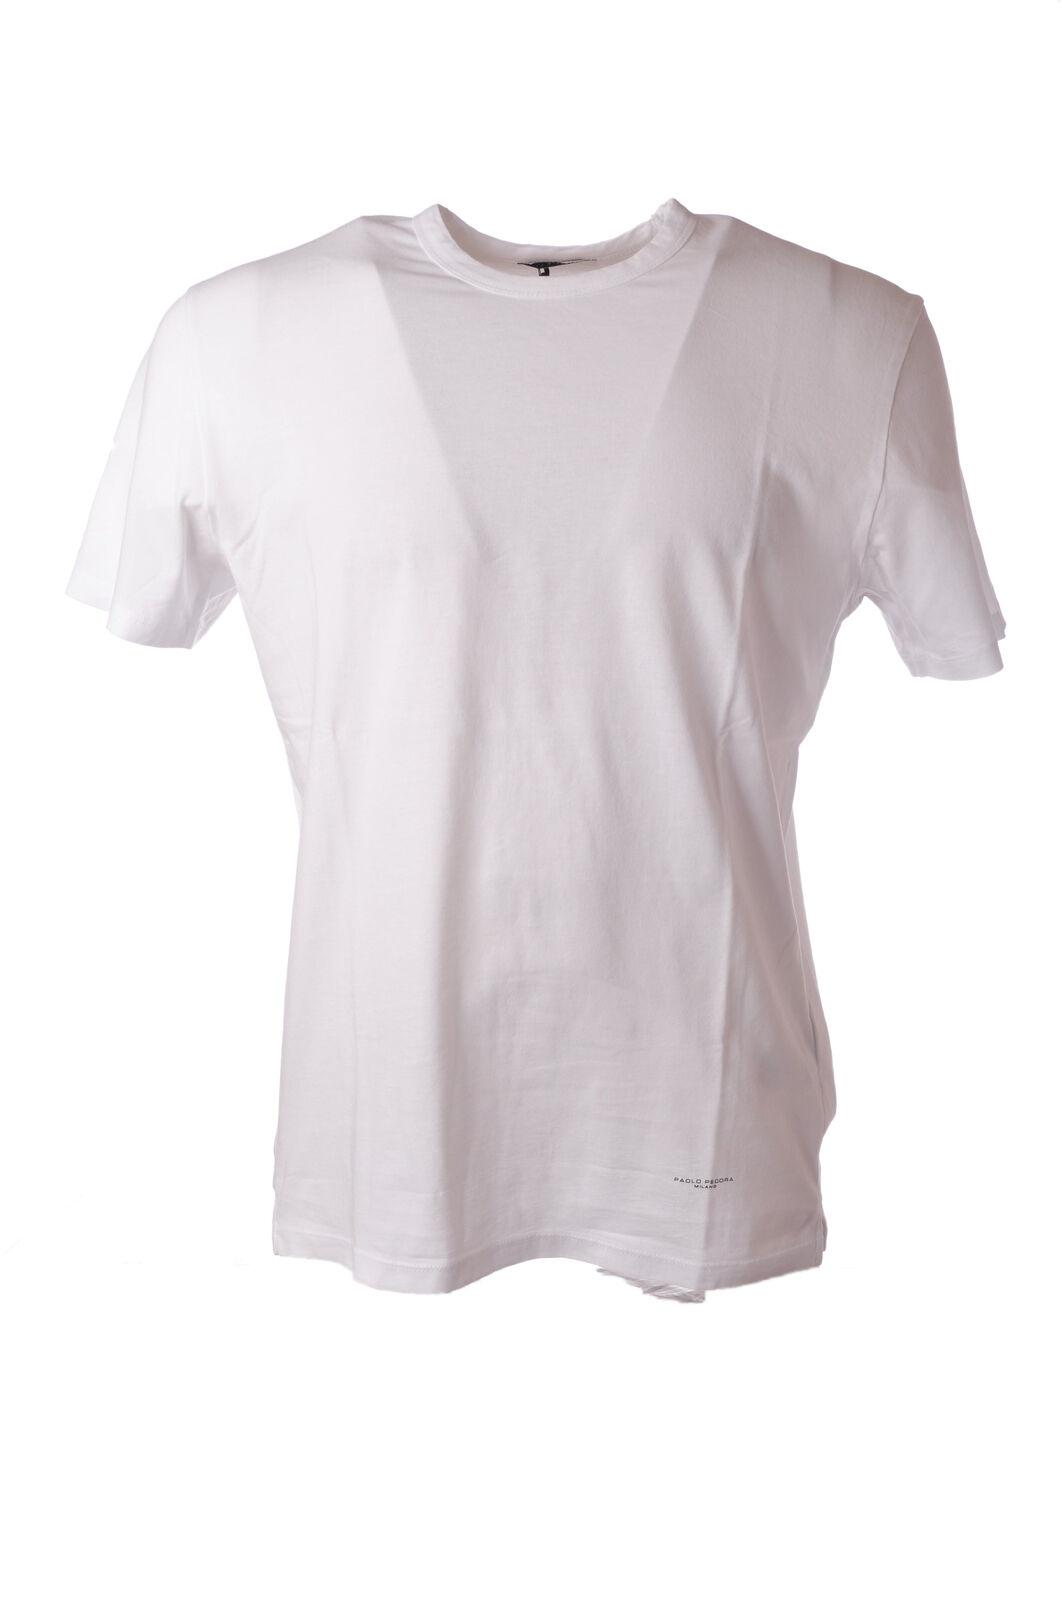 Paolo Pecora - Topwear-T-shirts - Mann - white - 5039426E183521